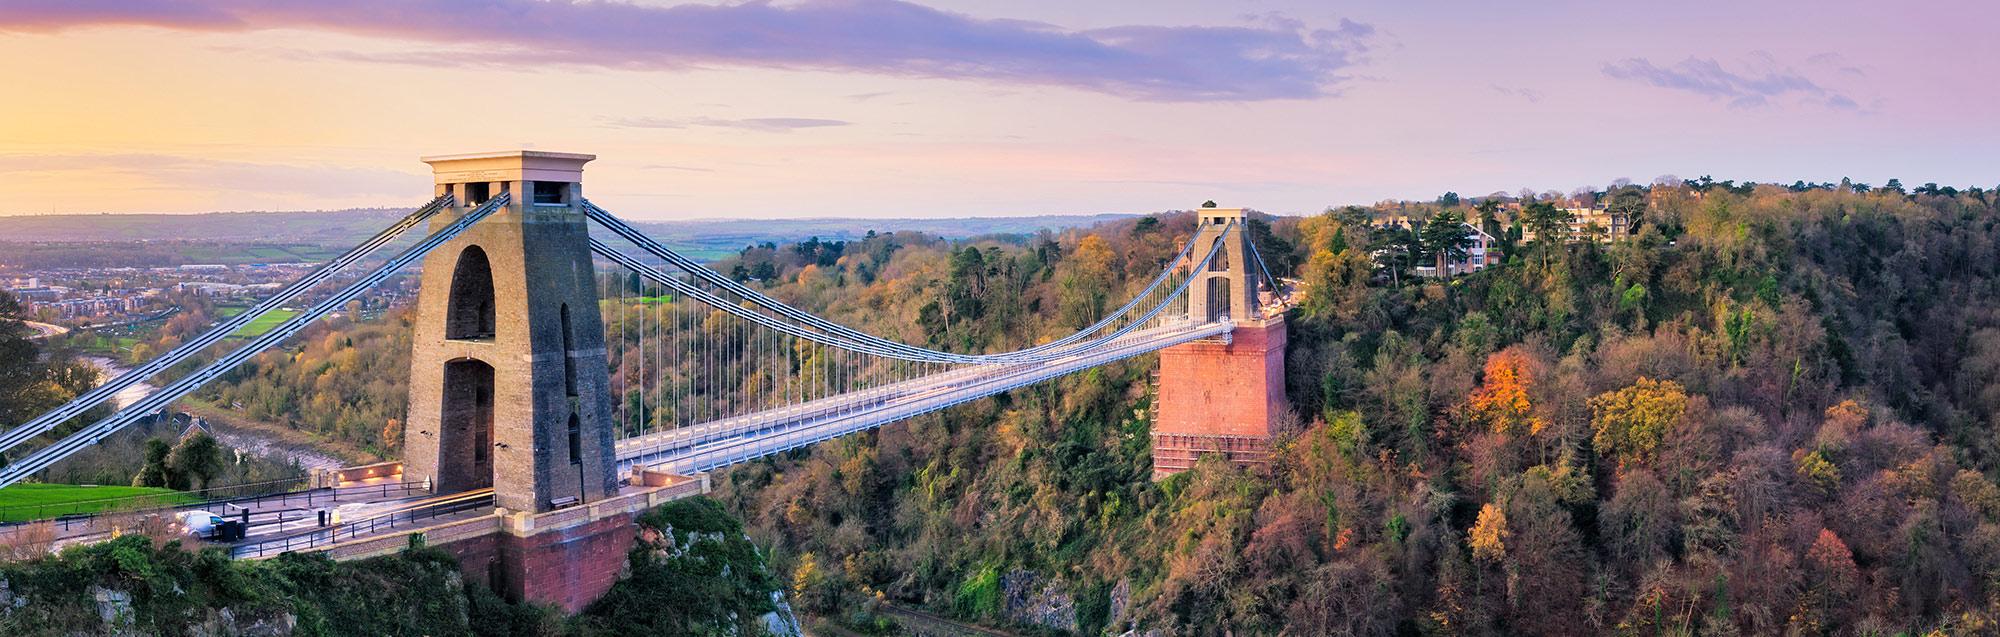 Vacanze studio di Inglese a Bristol